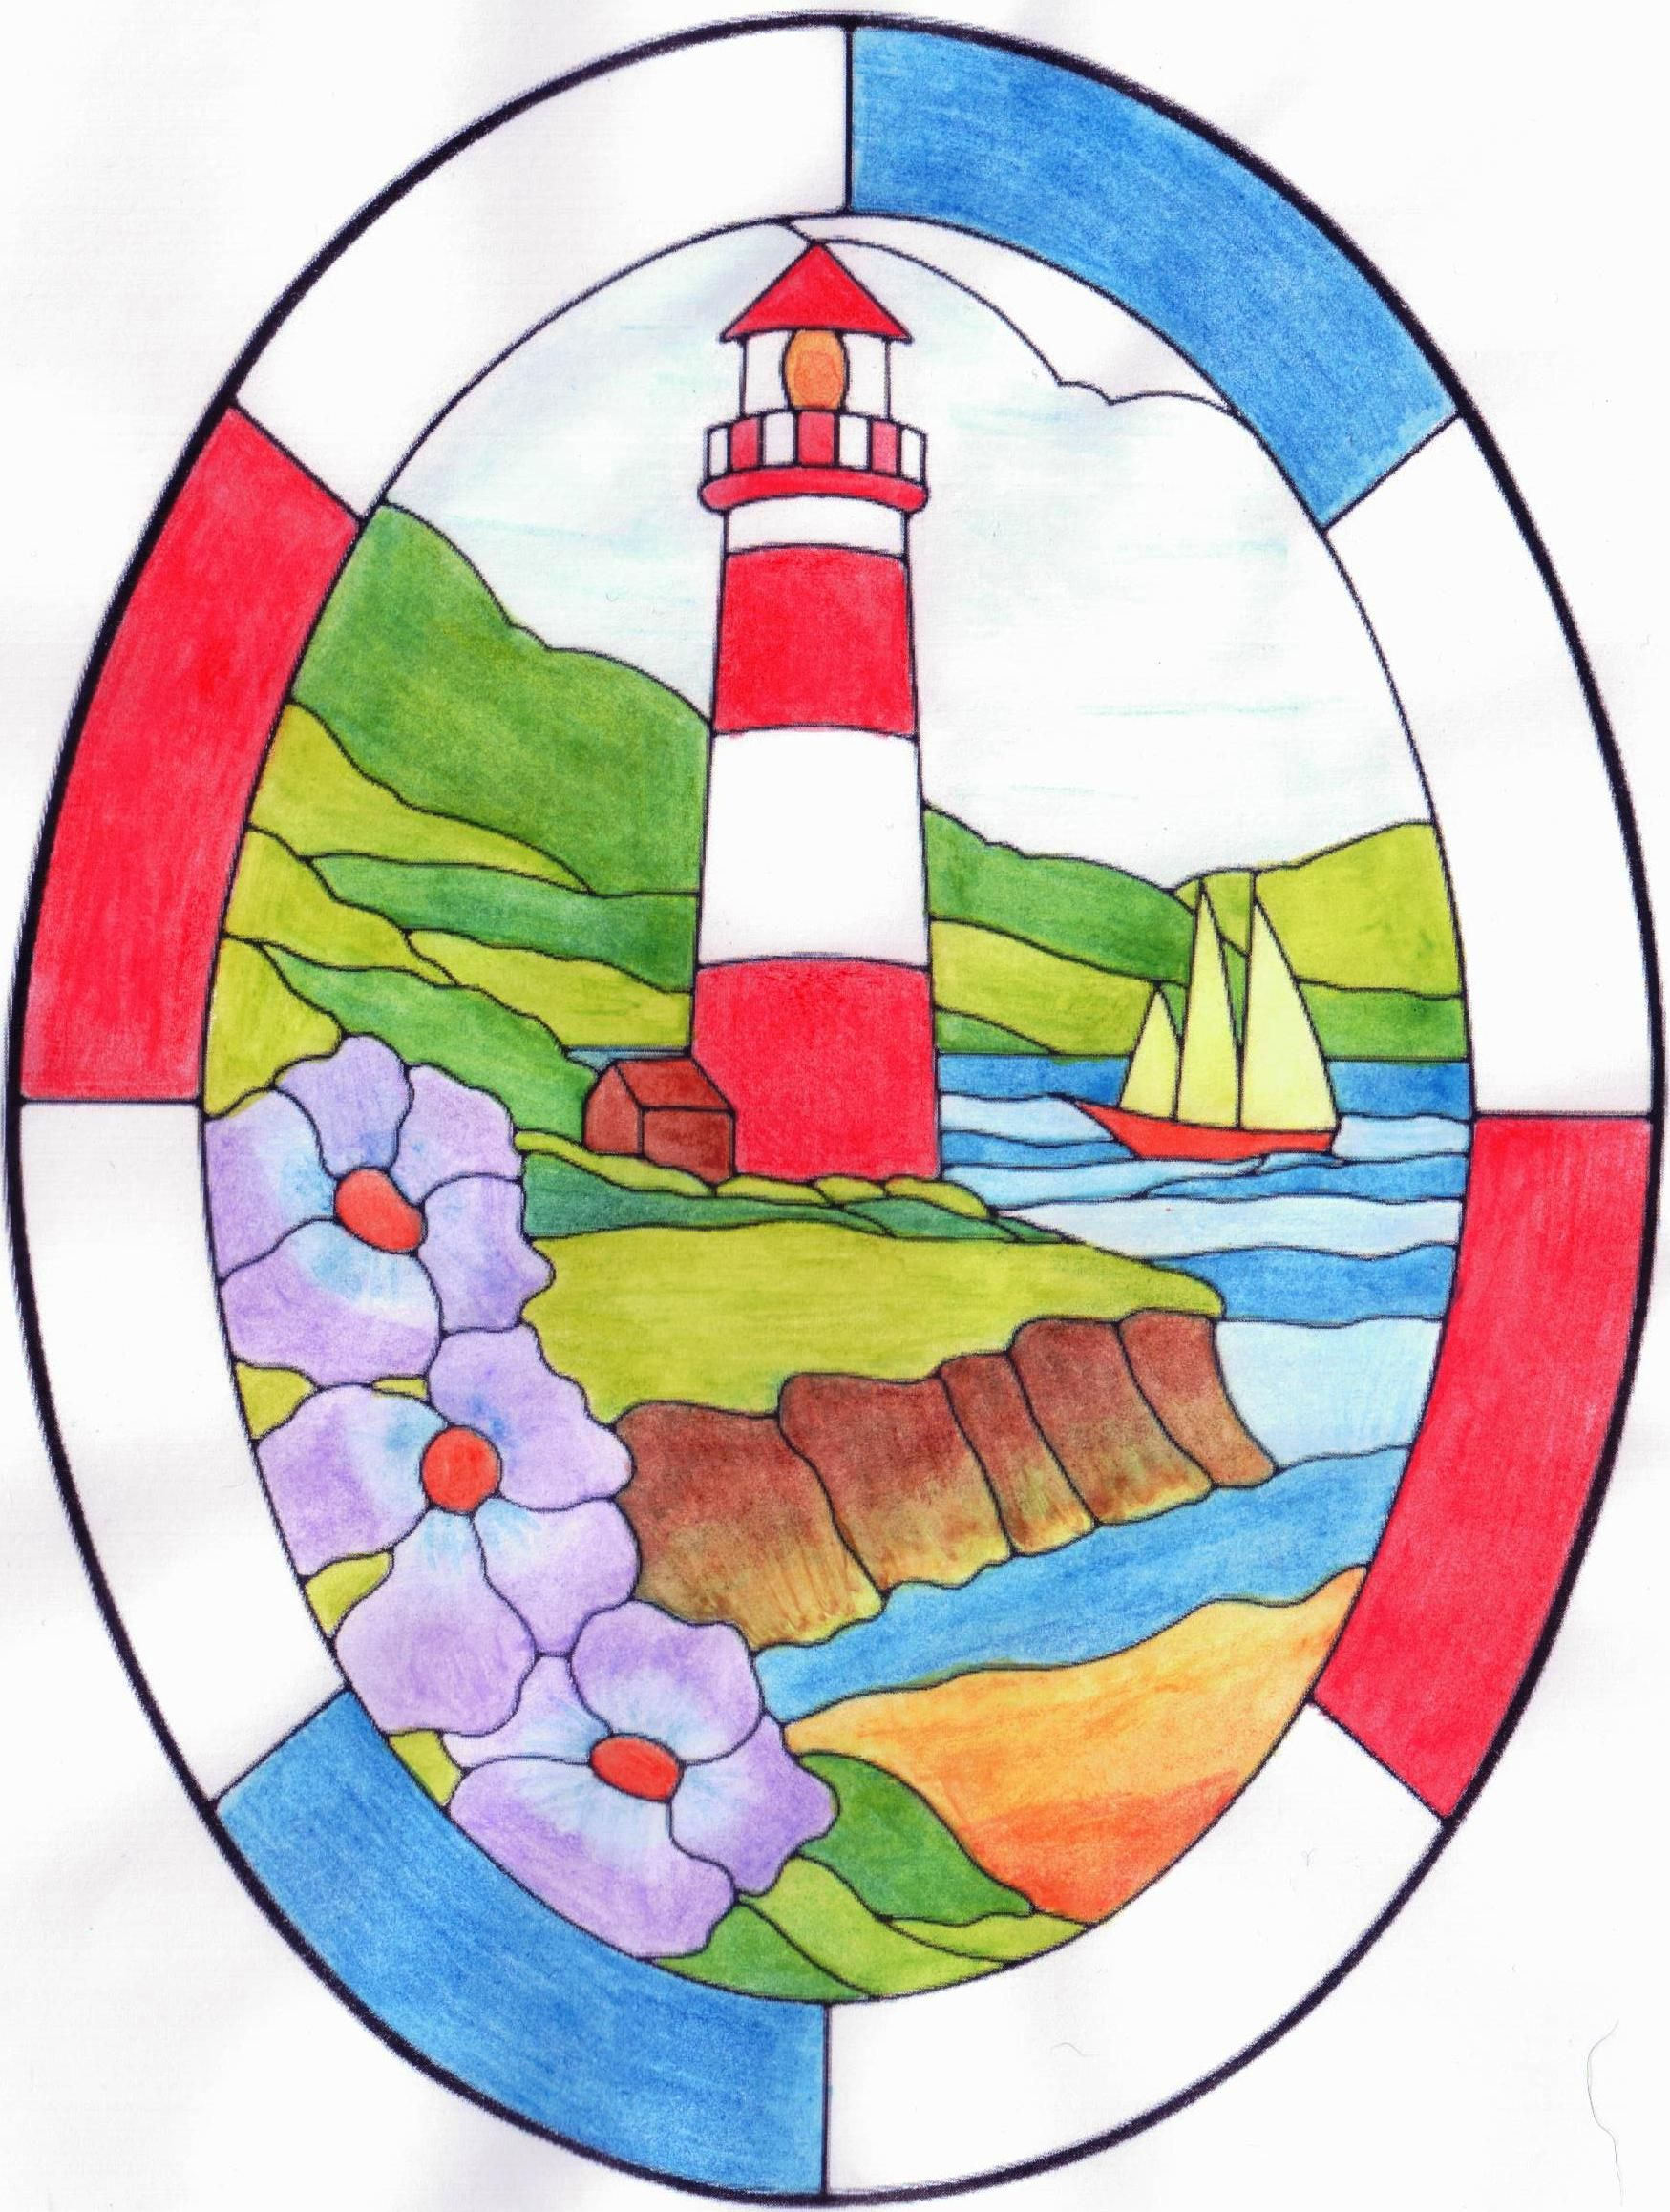 Vuurtoren Kleurplaat Colouring Page Lighthouse Met Aquarelpotlood Christmas Drawing Nautical Cards Colouring Pages